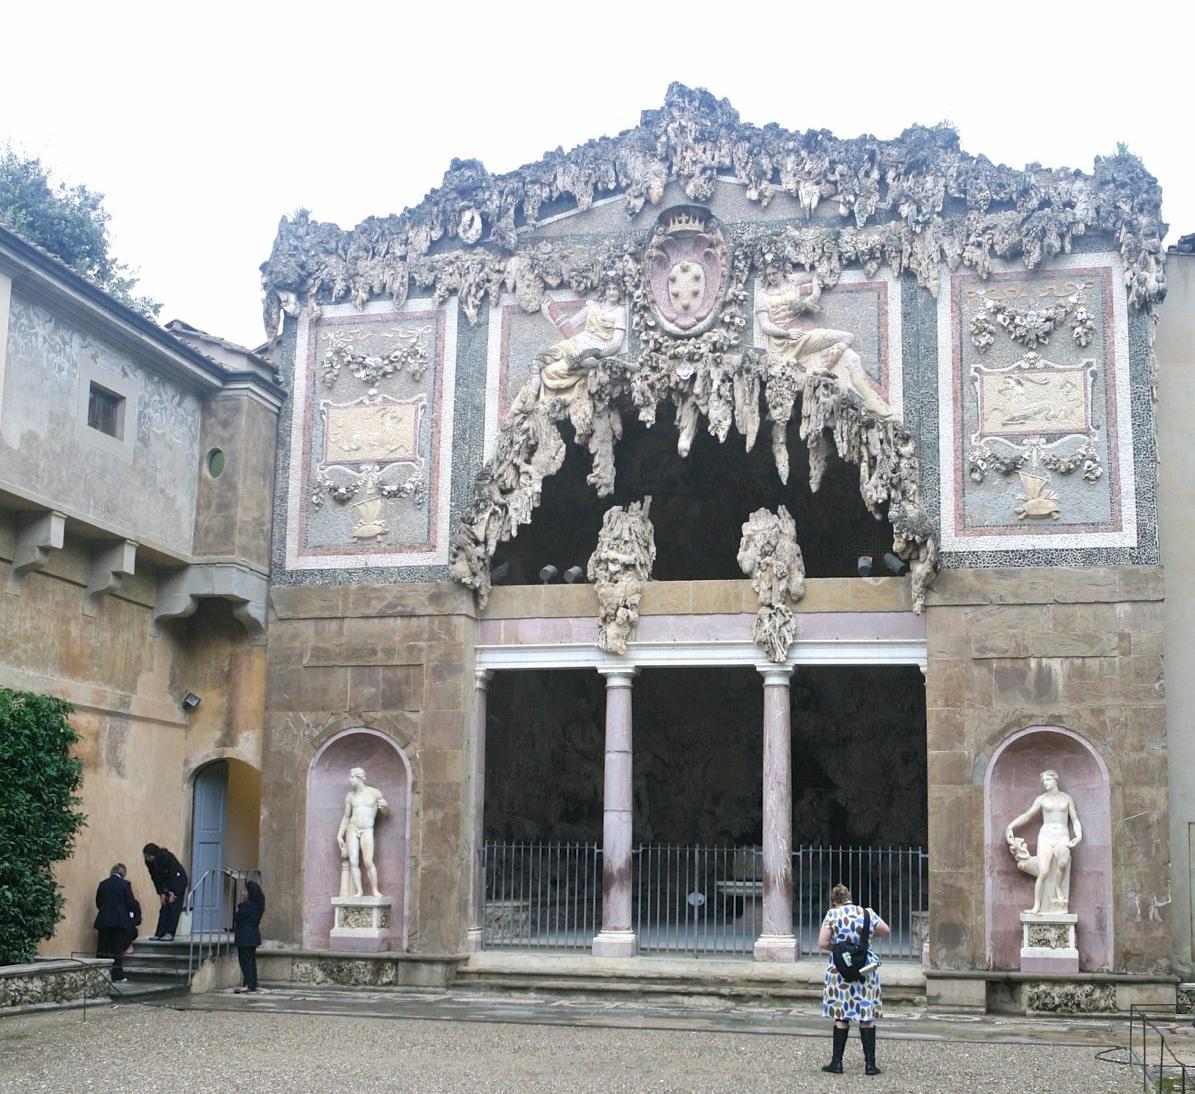 Grotta Grande by architect Bernardo Buontalenti,1593.